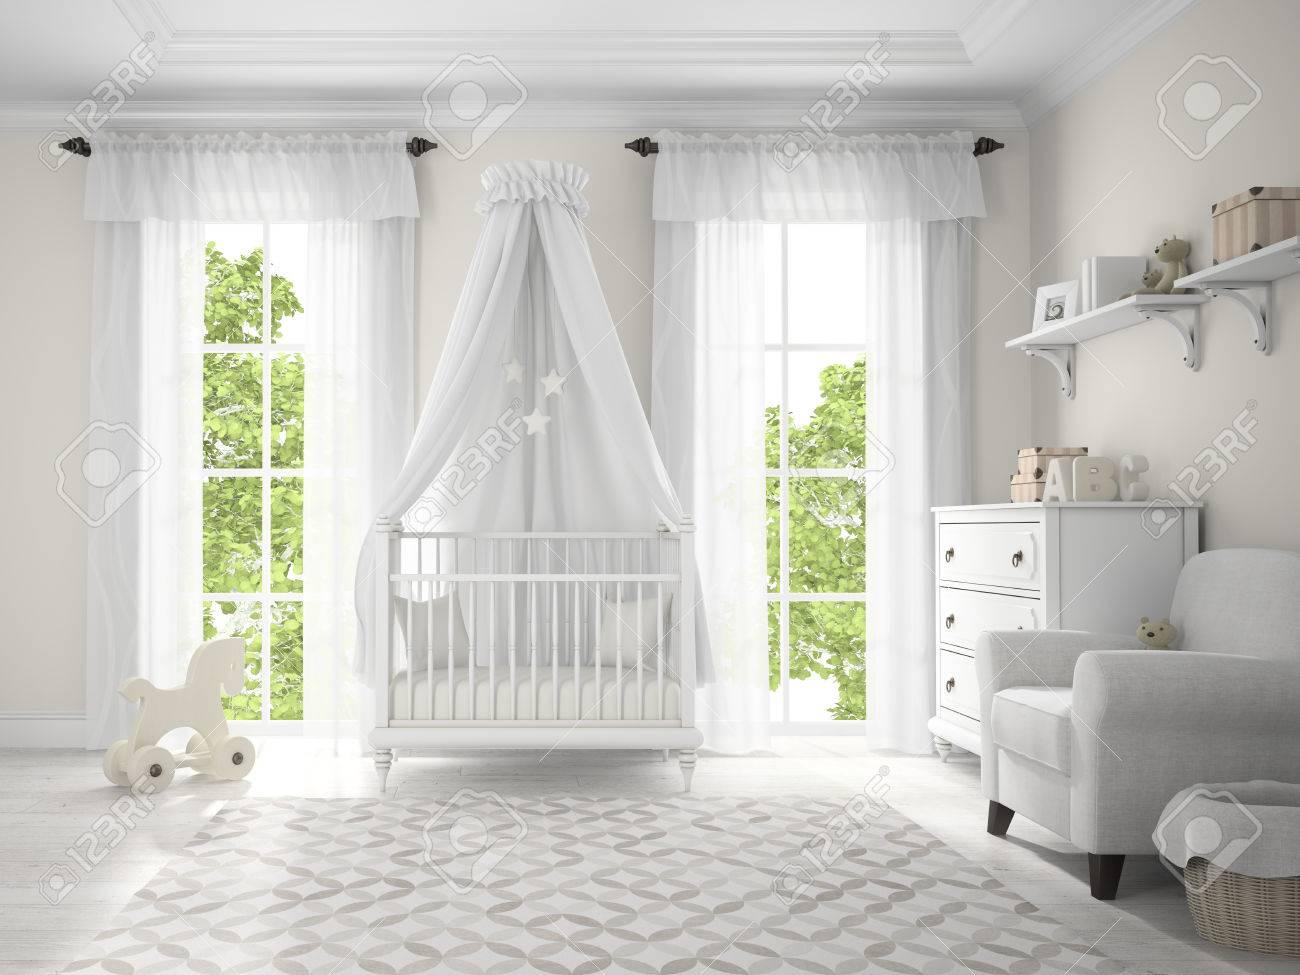 Classic children room with cradle 3D rendering Stock Photo - 57656246